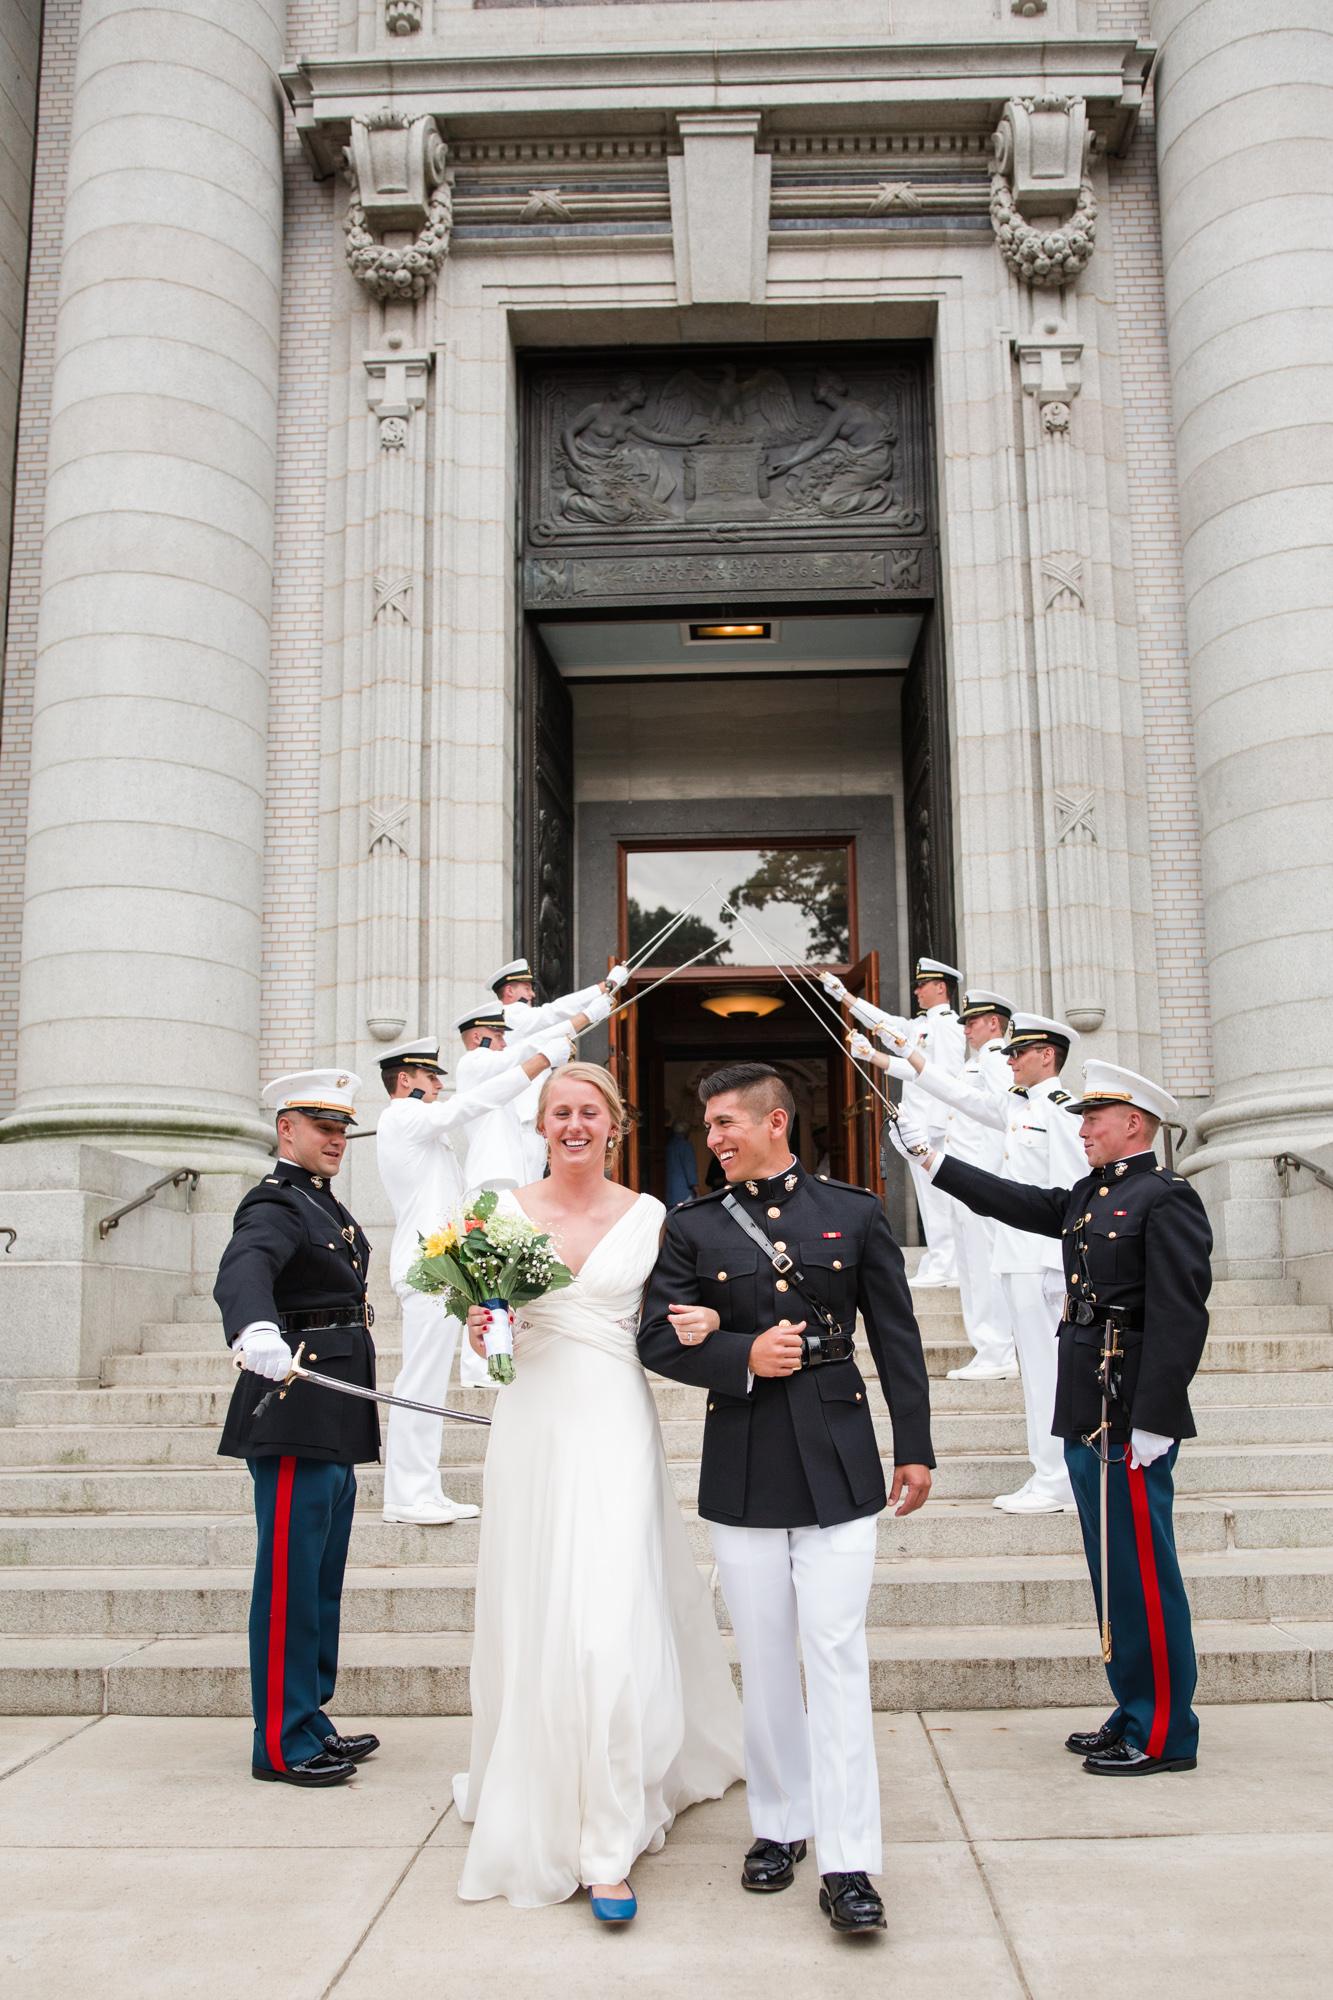 2017_05_27_ray_caroline_naval_wedding-6548.jpg